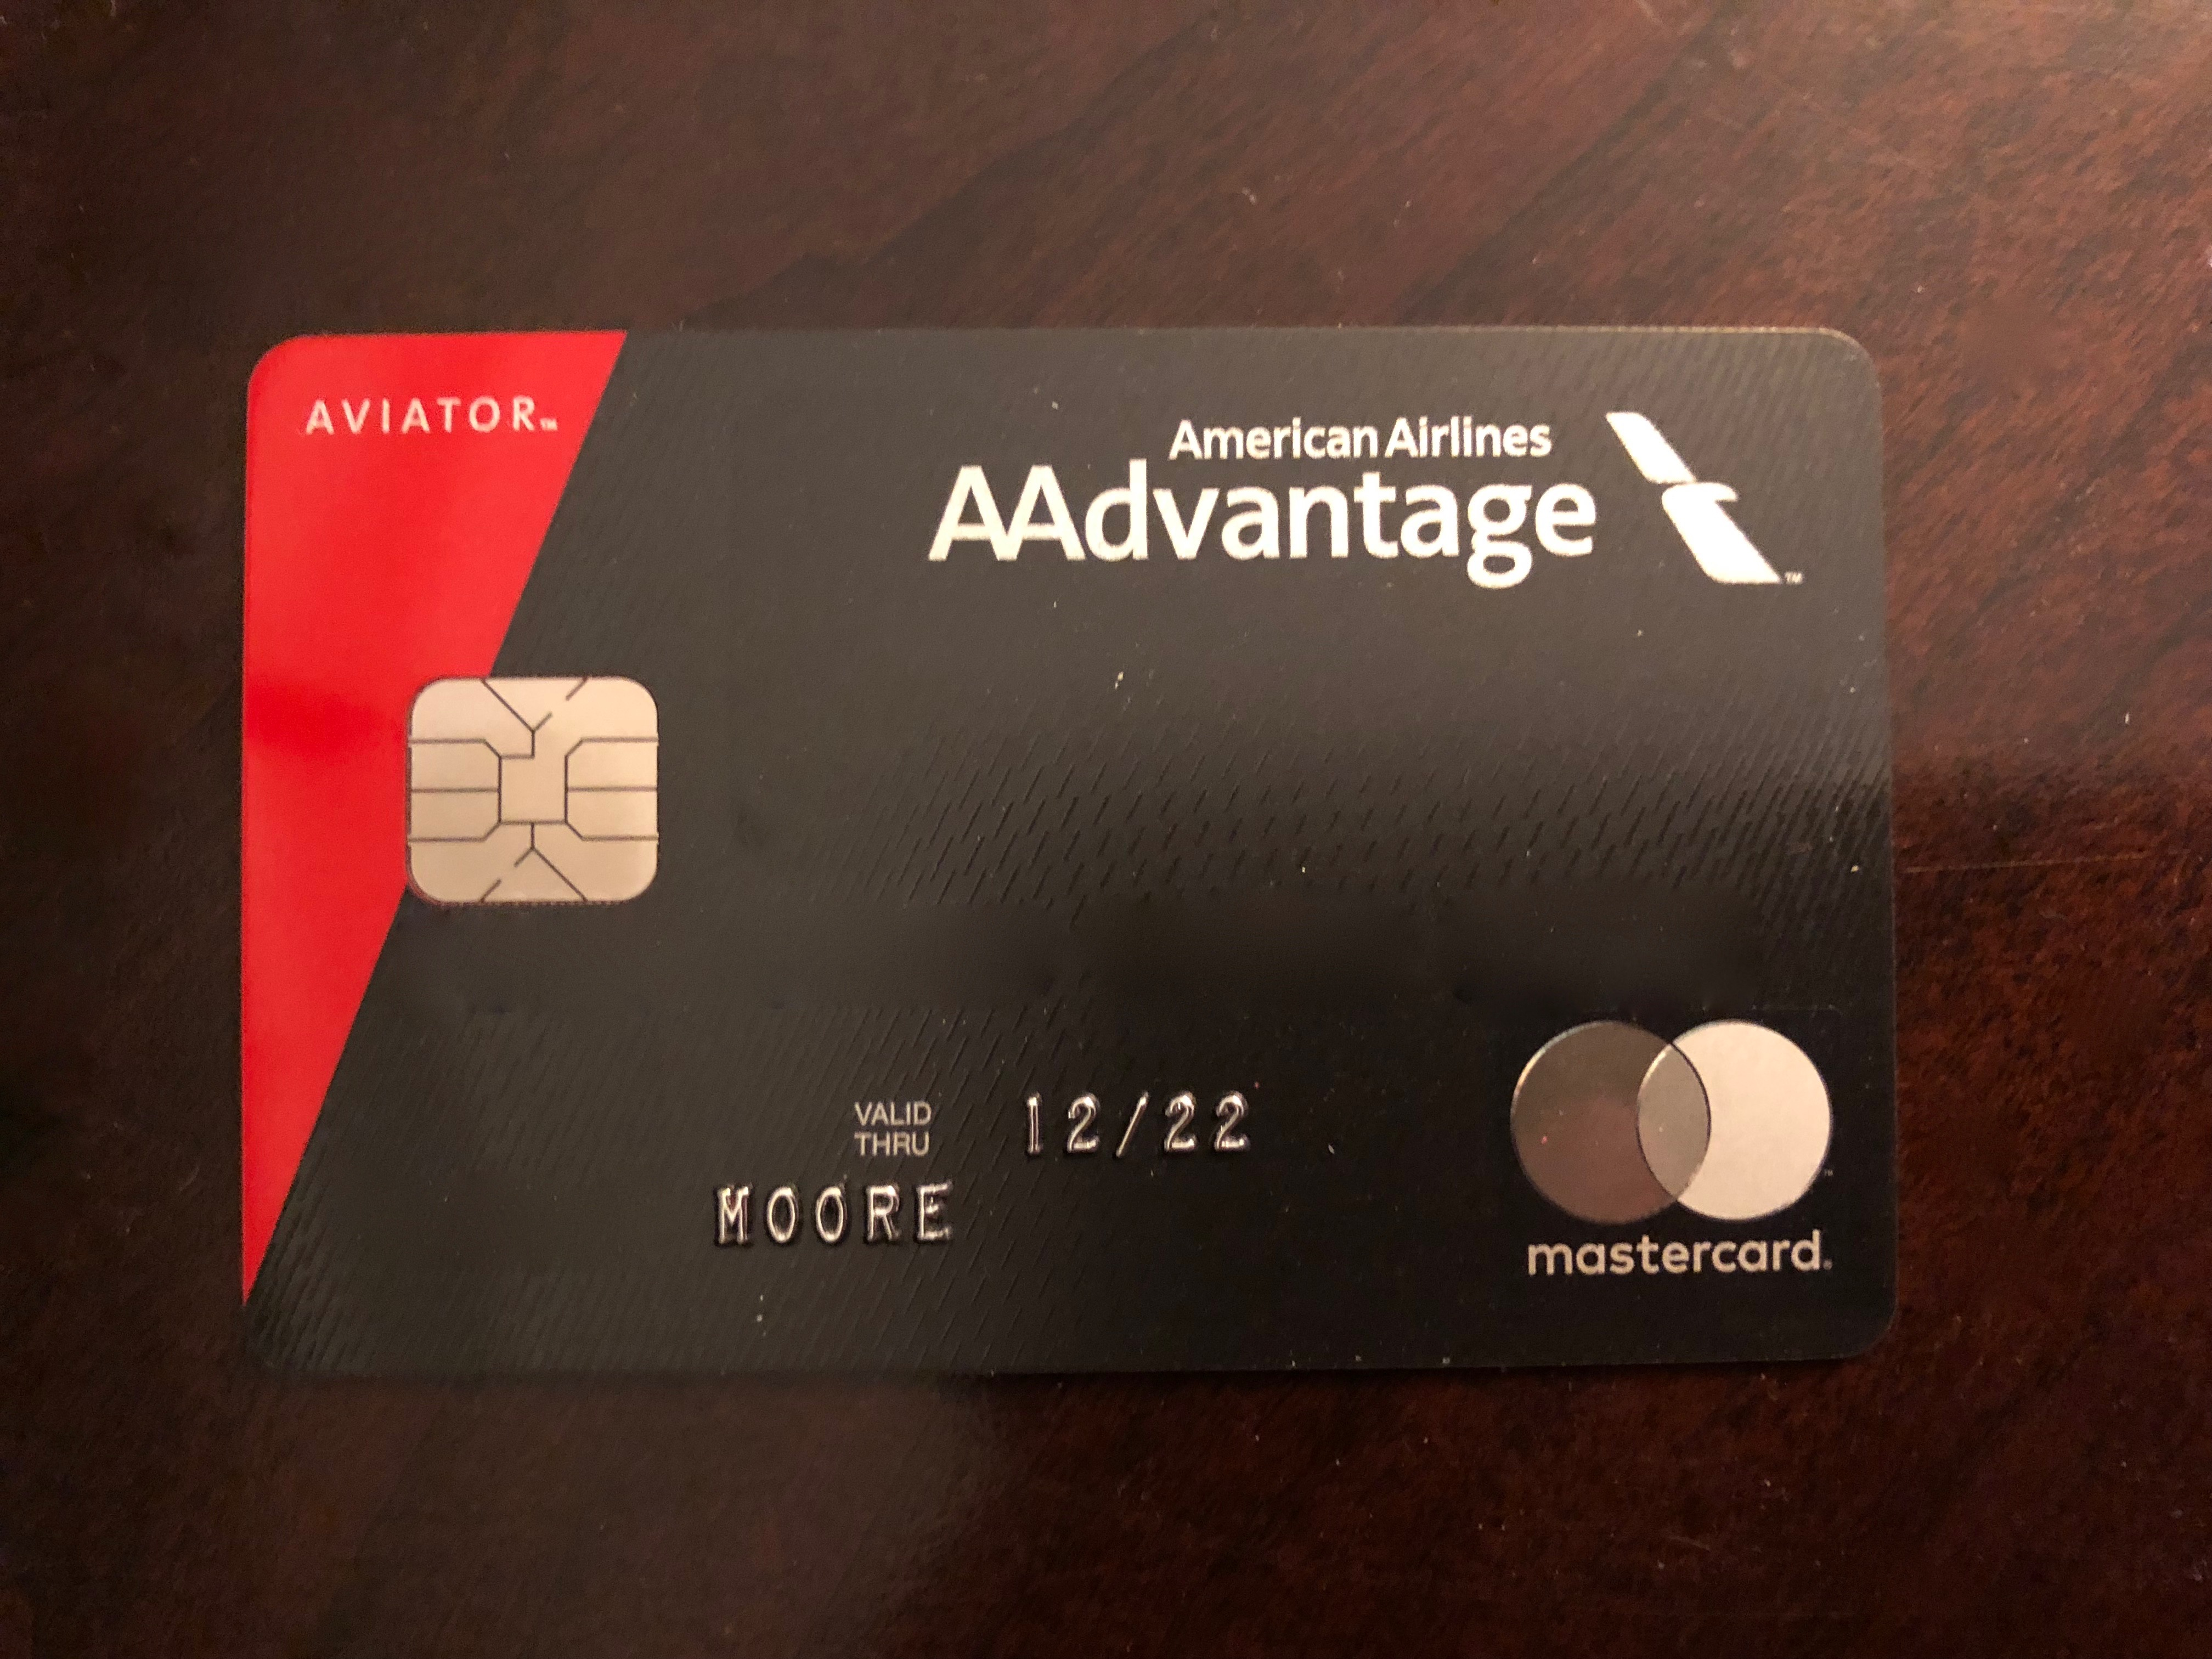 The Barclaycard AAdvantage Aviator Red Card Finally Arrived